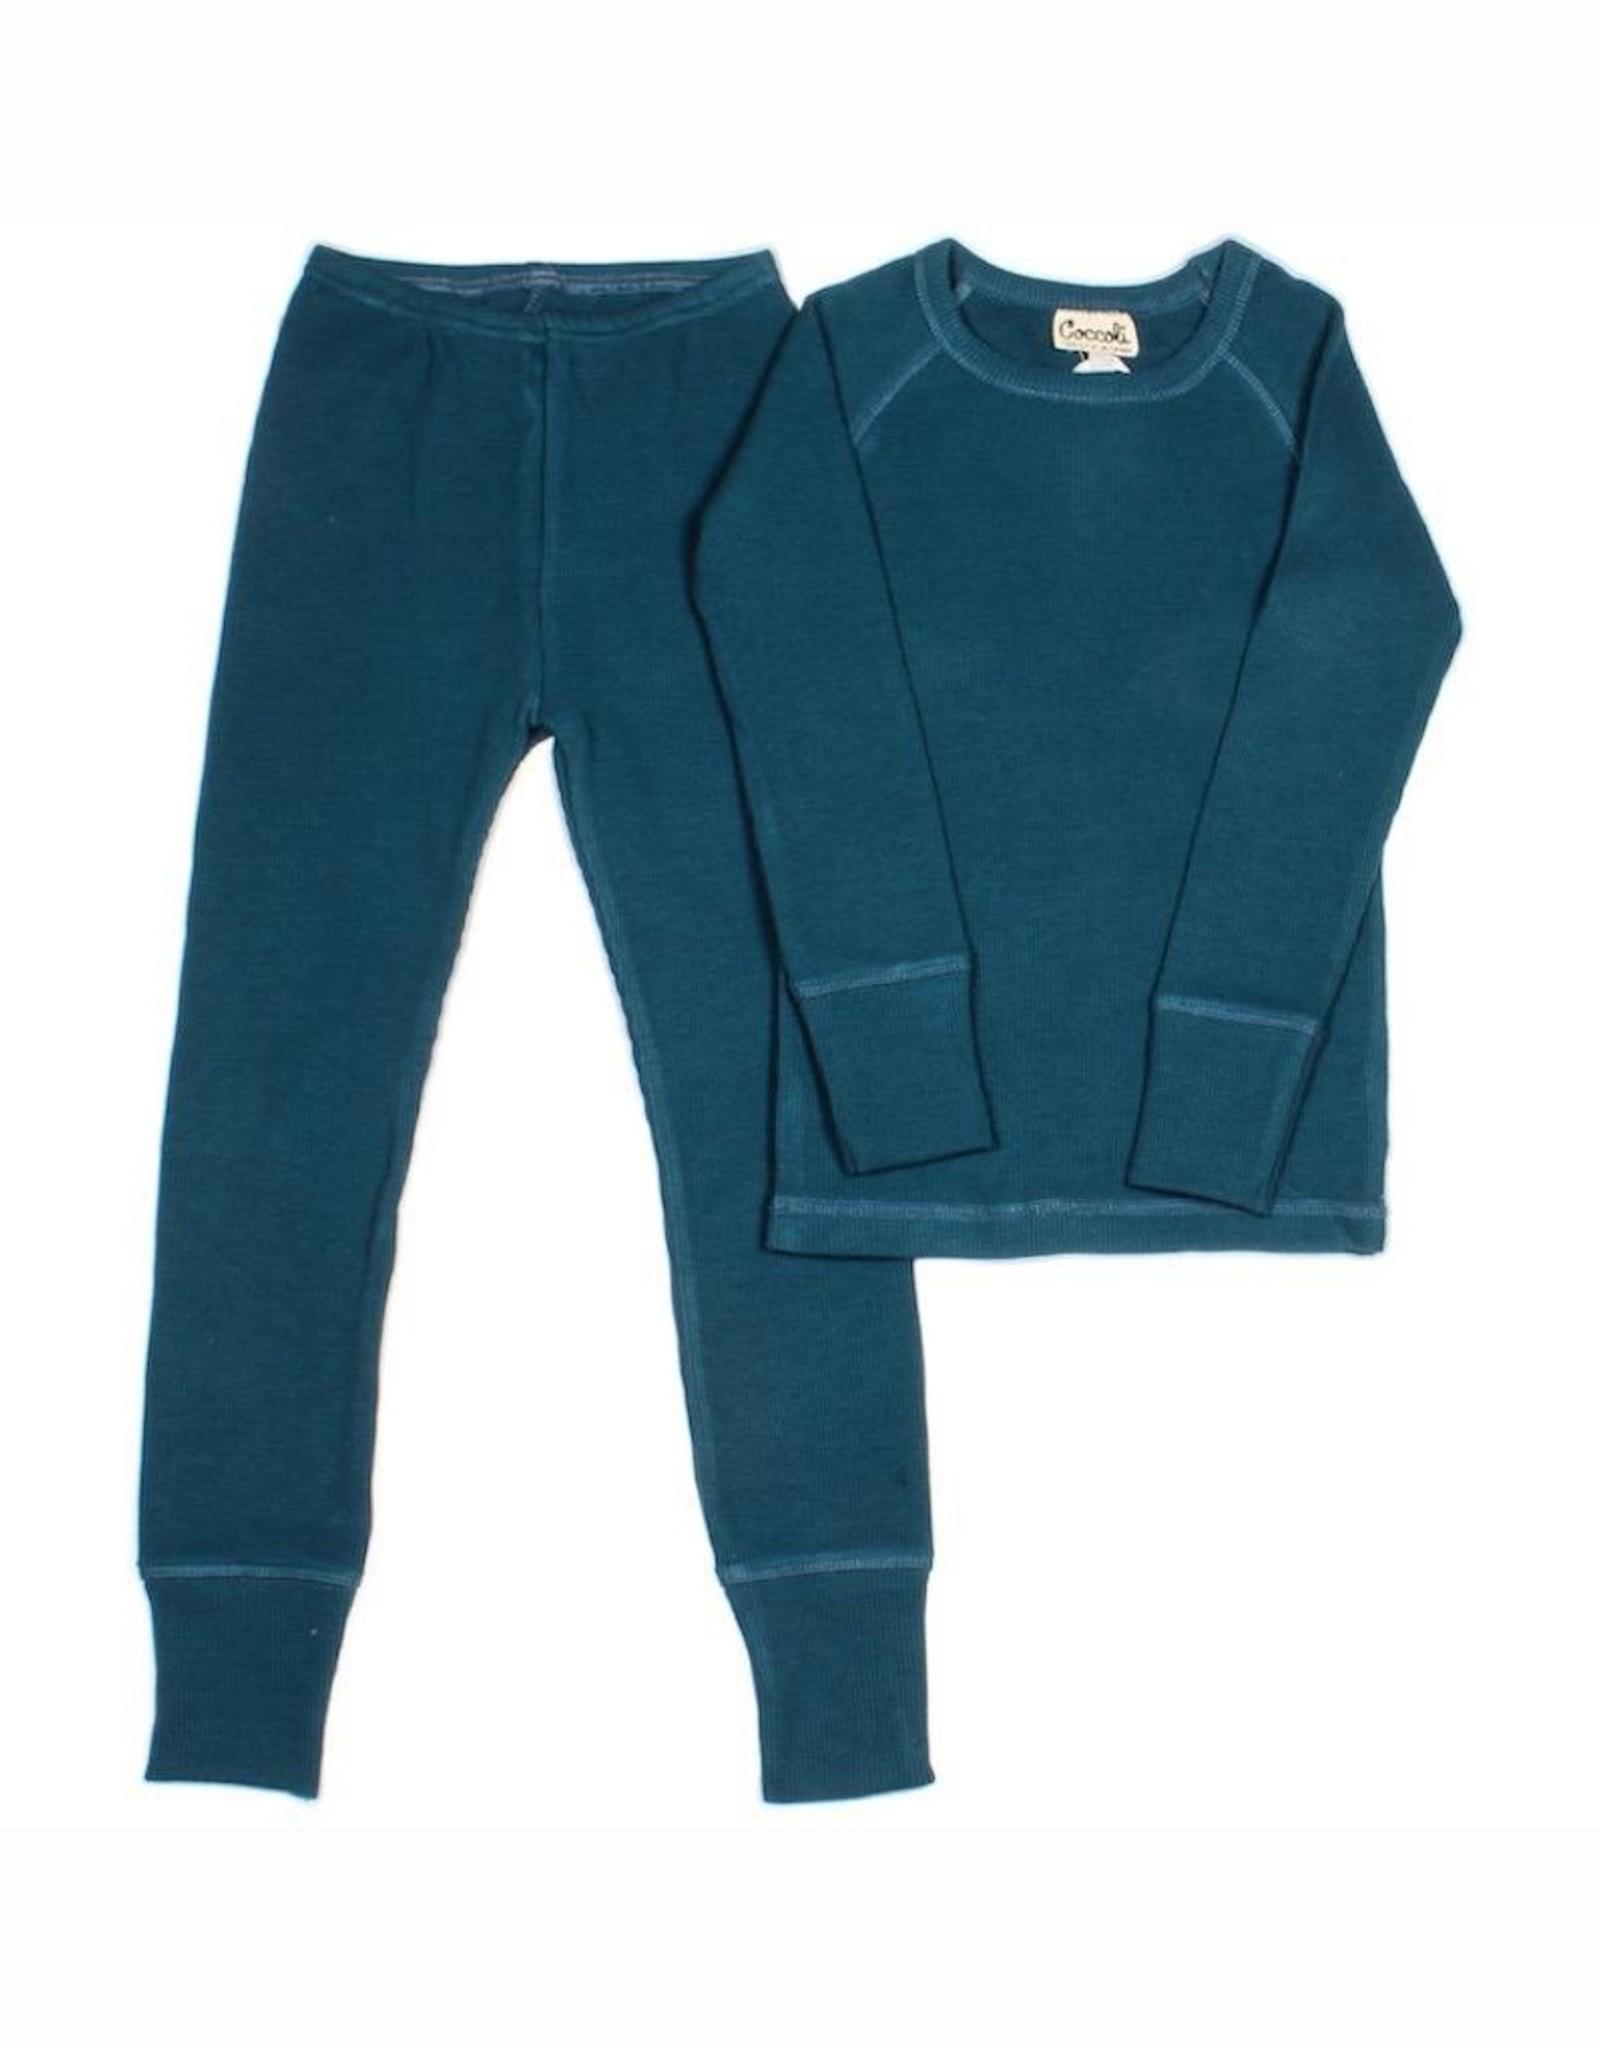 Blue Waffle Knit Pajama Set